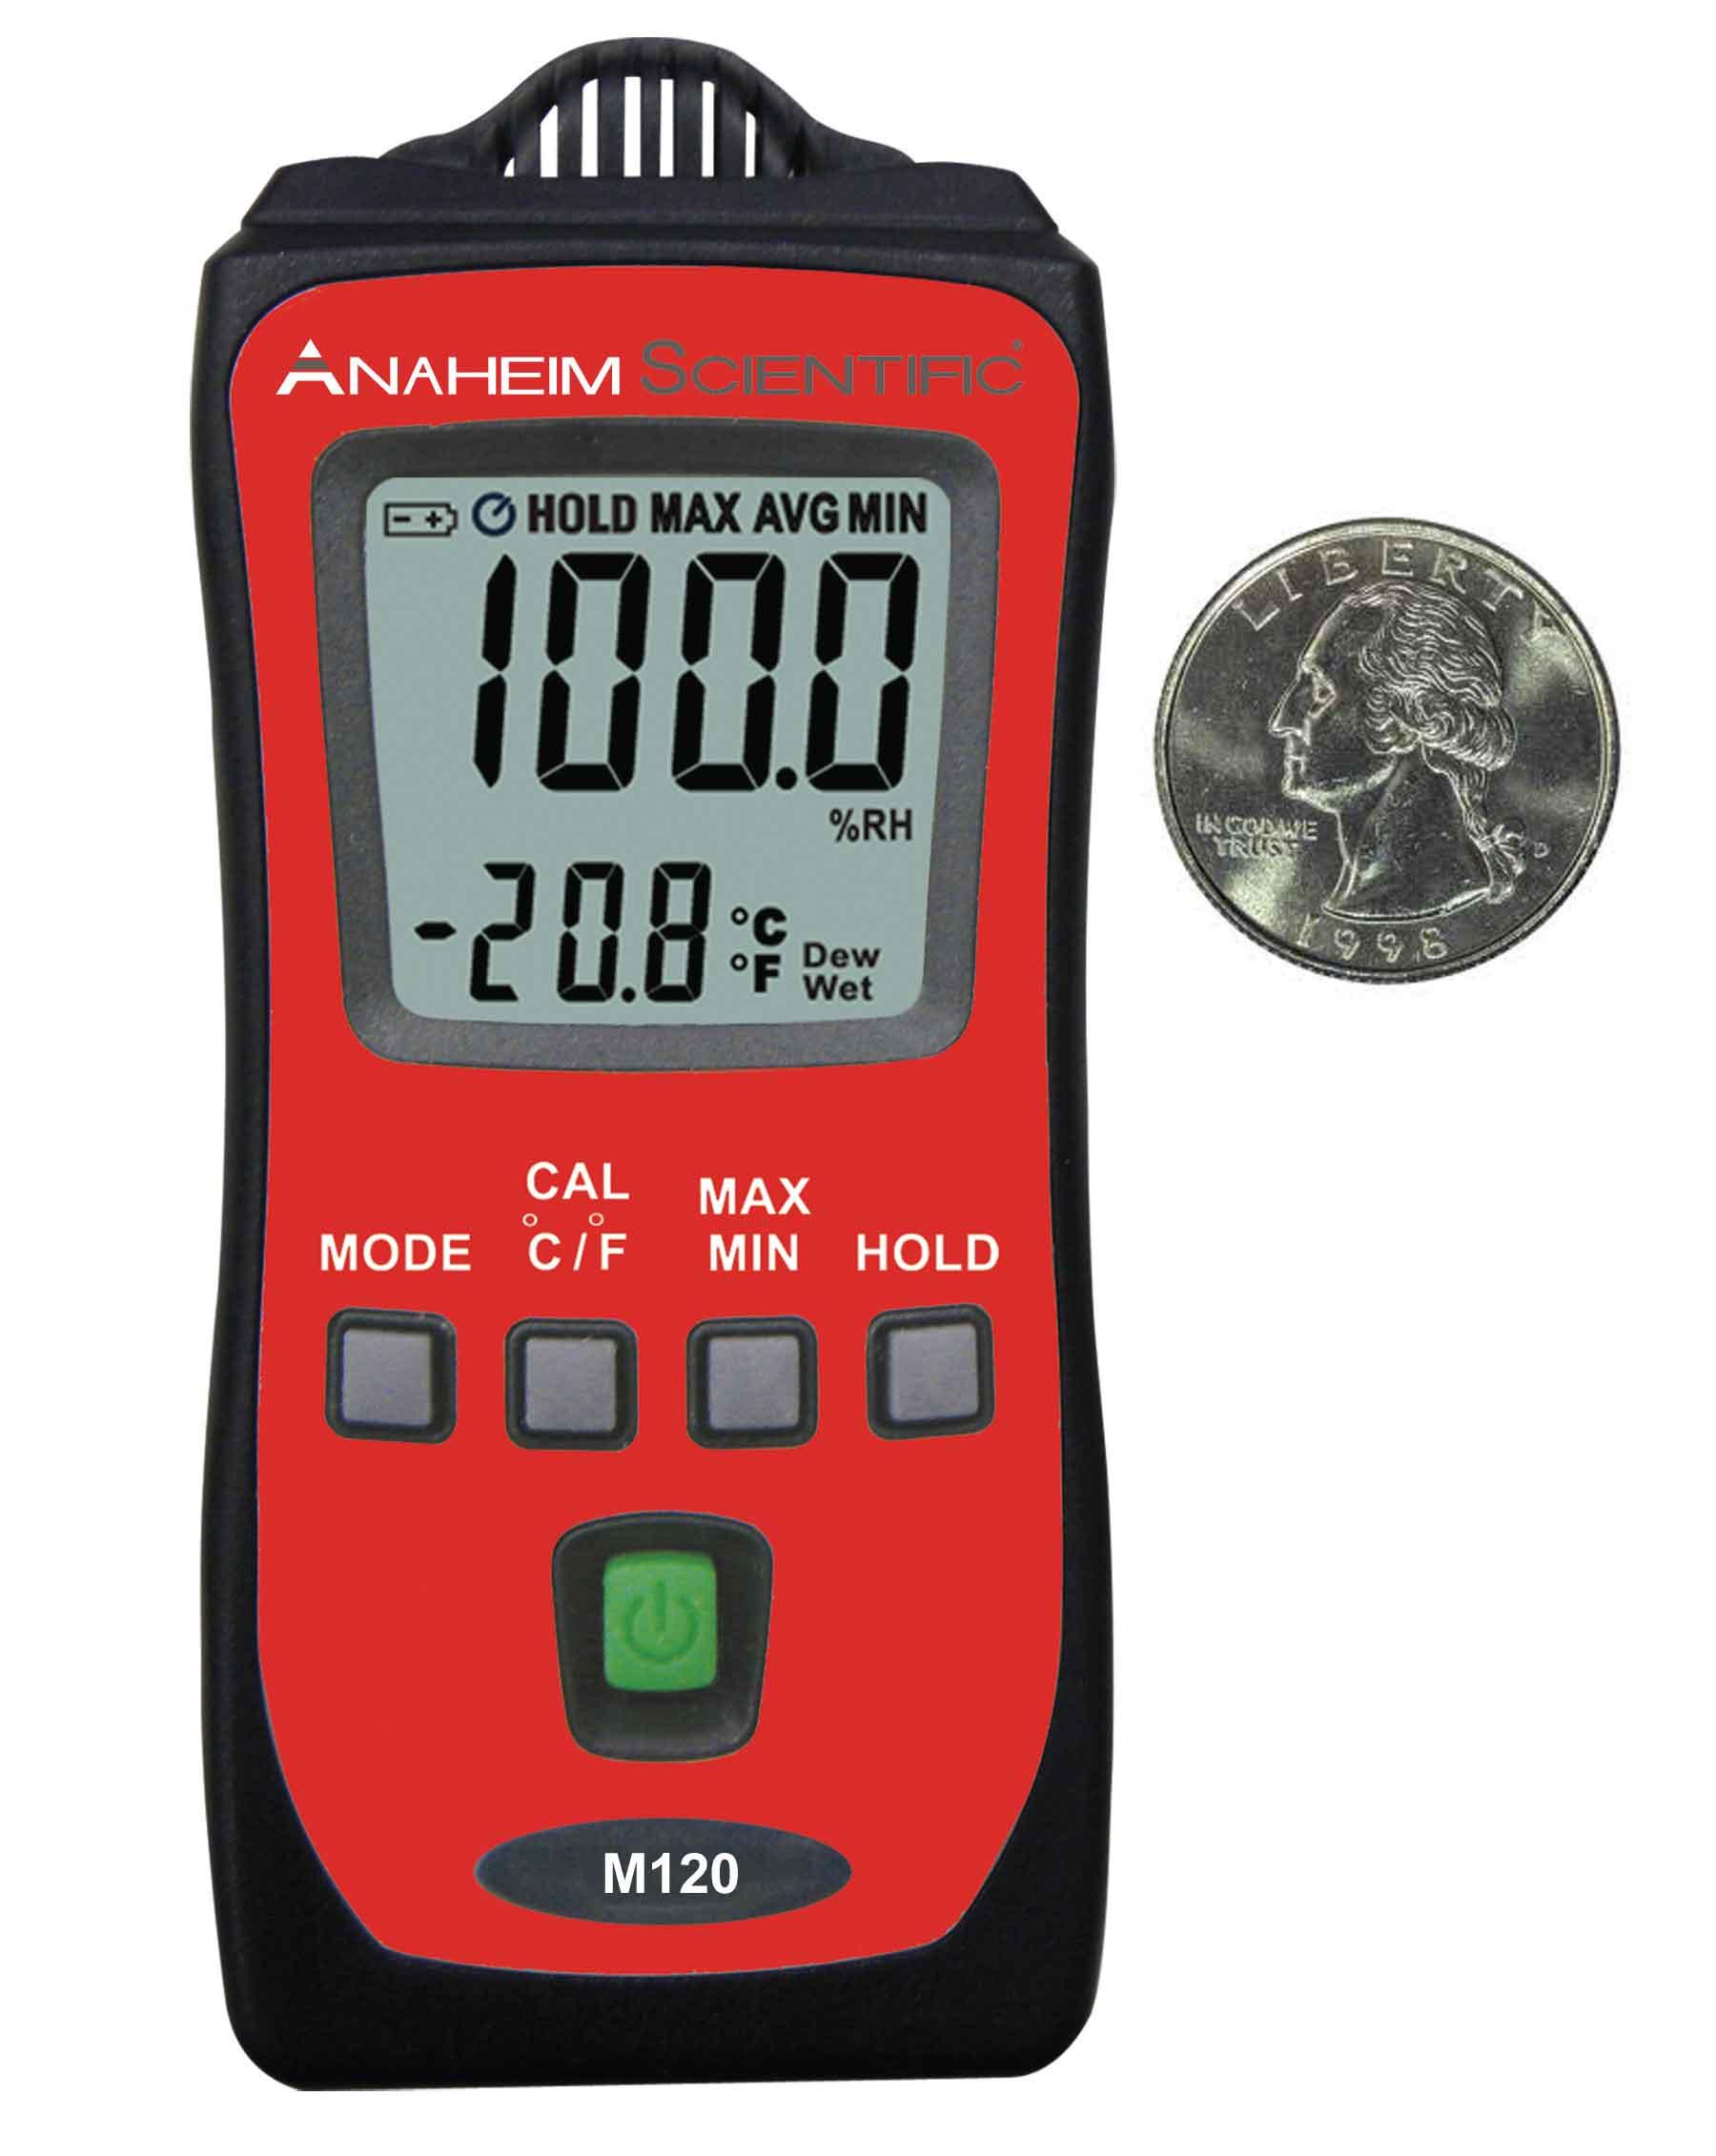 Global Specialties M120 Mini Temperature/Humidity Meter Photo